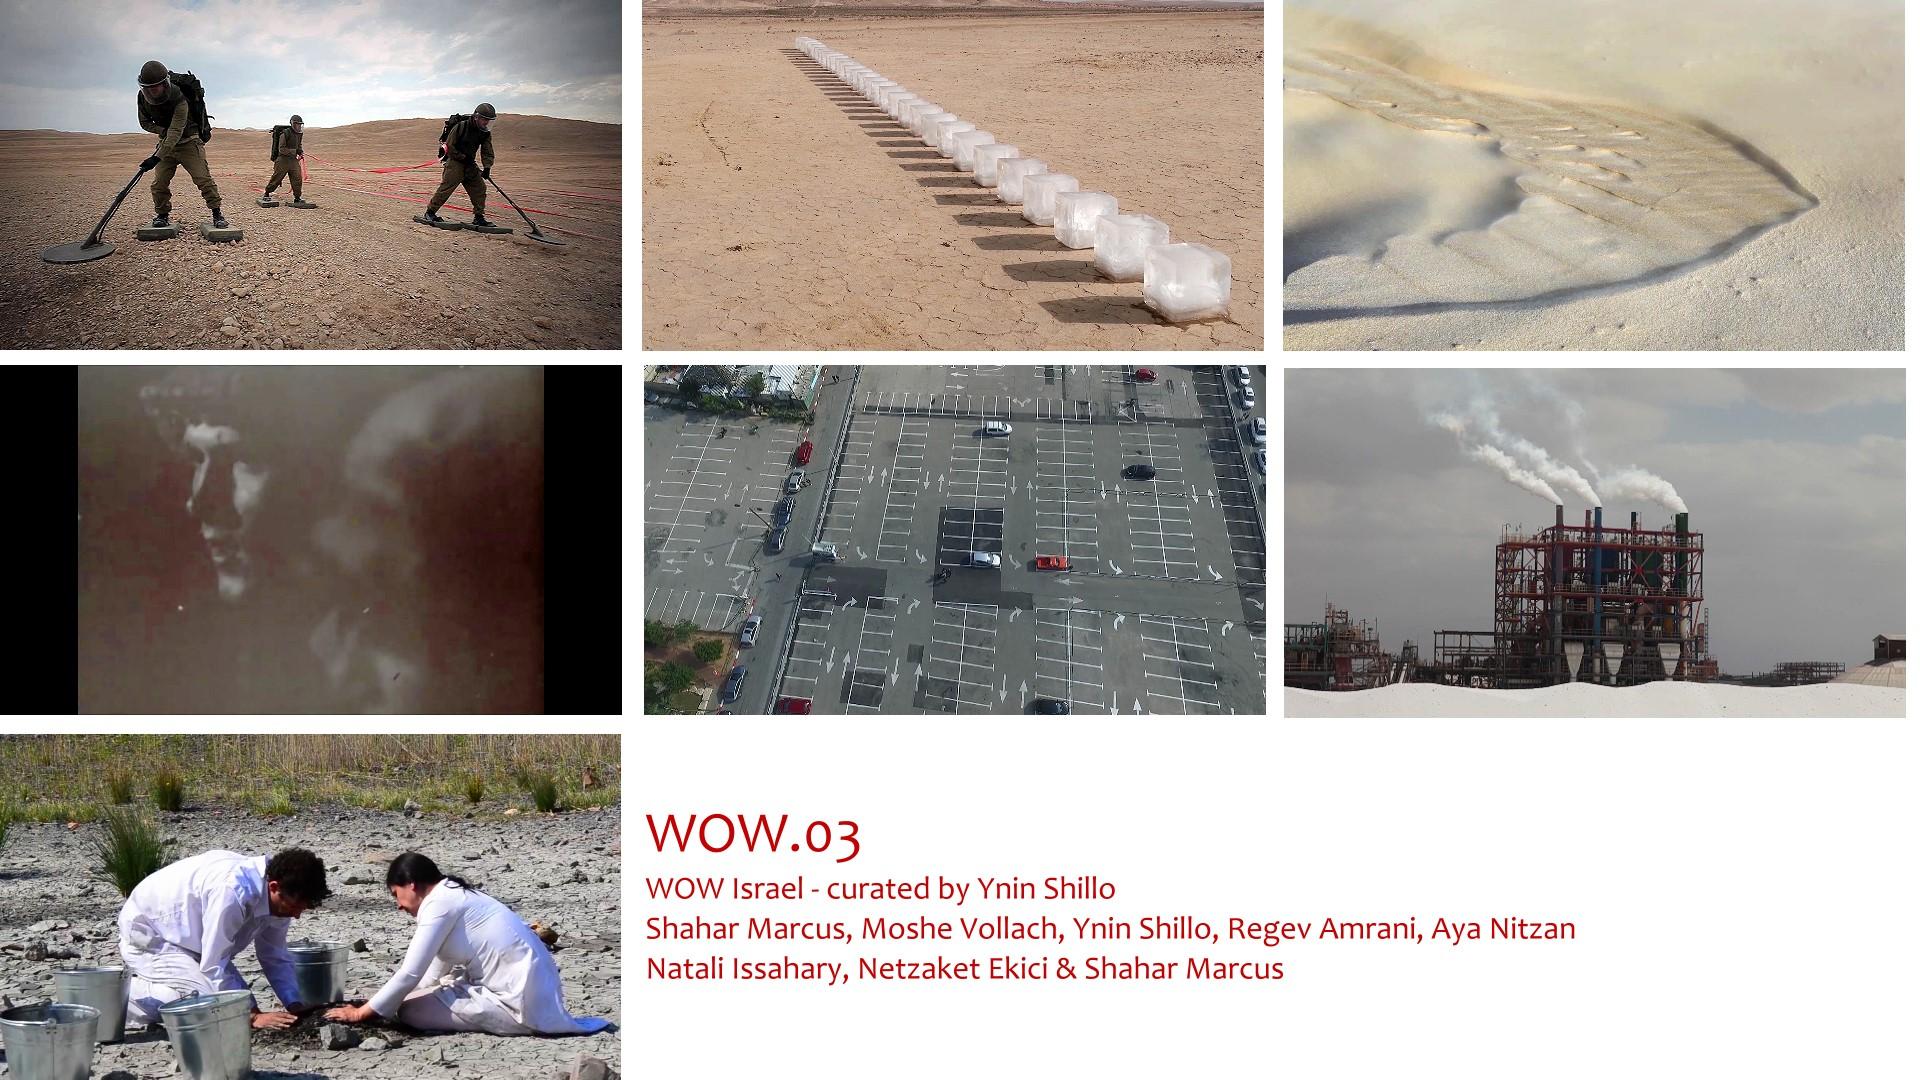 wow.03-israel-1.jpg